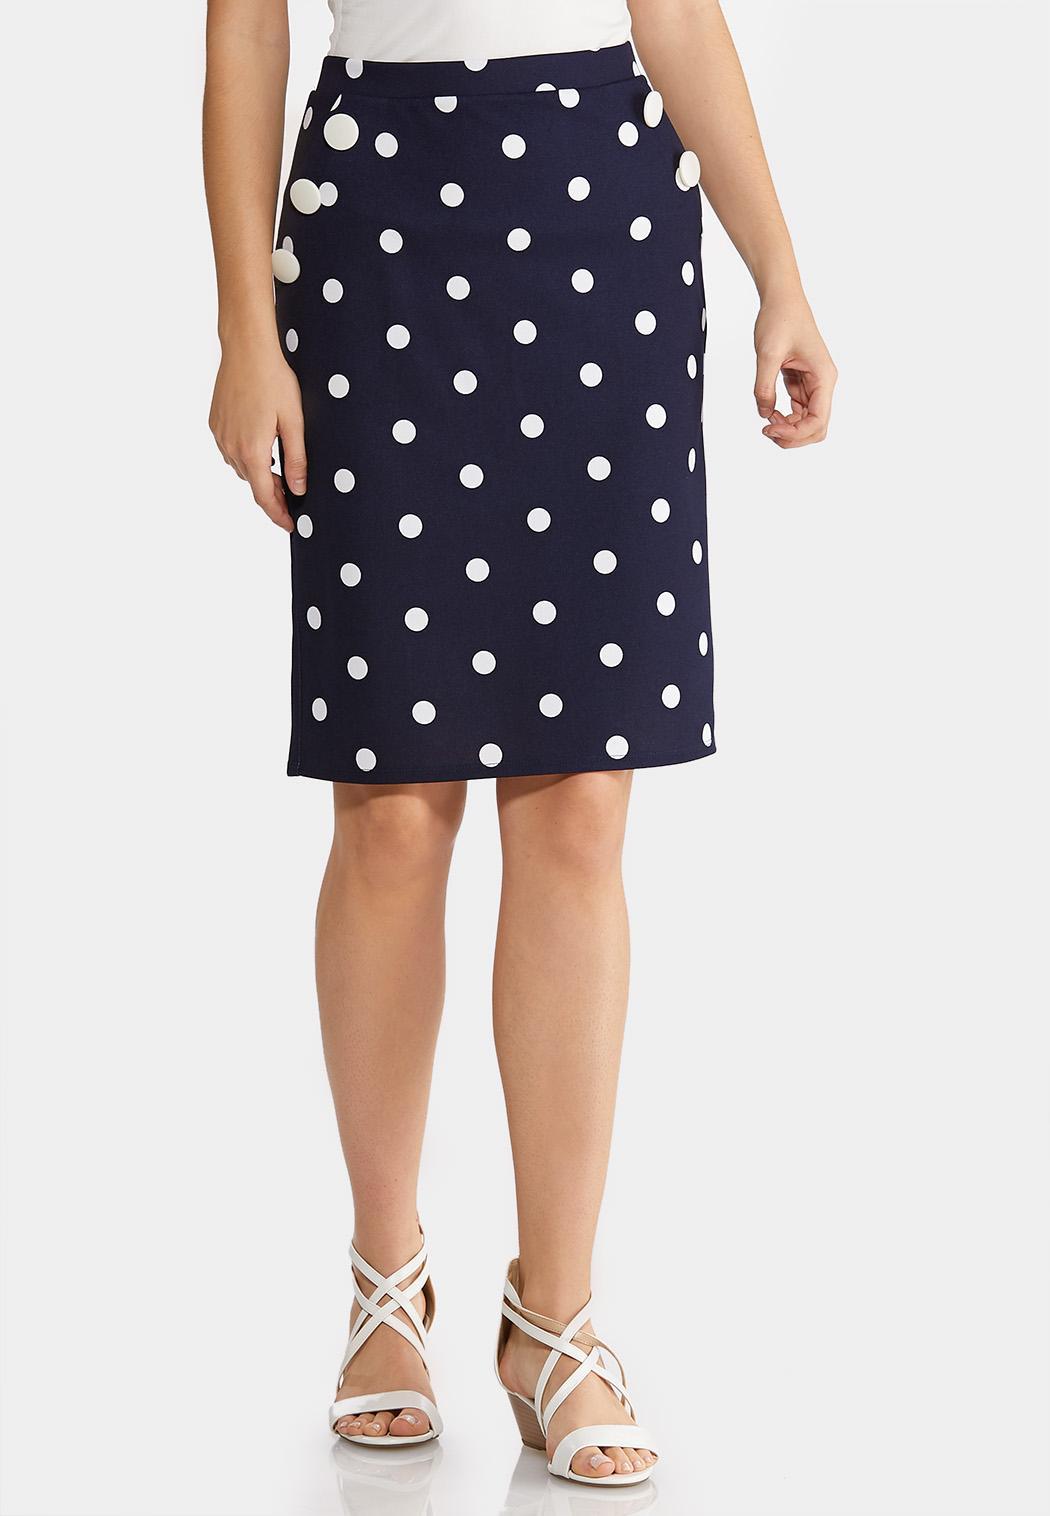 35bb97c9e8 Polka Dot Pencil Skirt alternate view Polka Dot Pencil Skirt